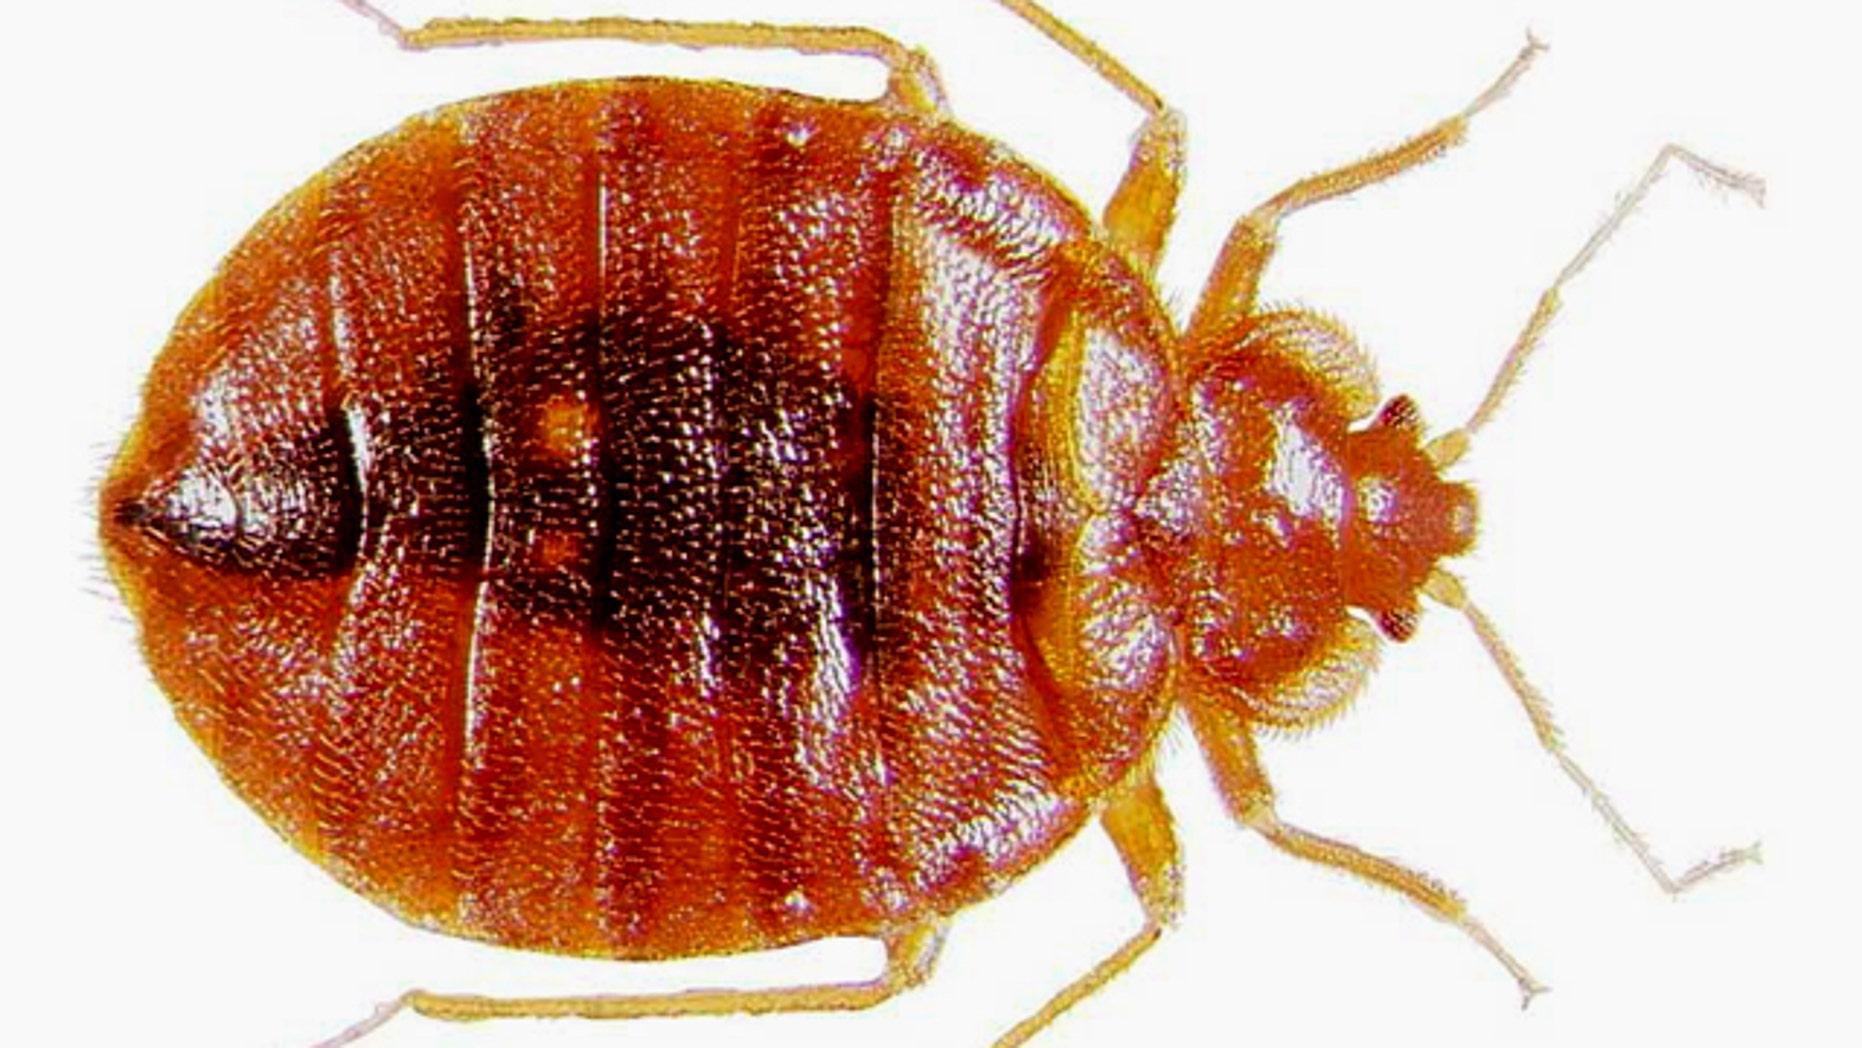 Adult bedbug at high magnification.